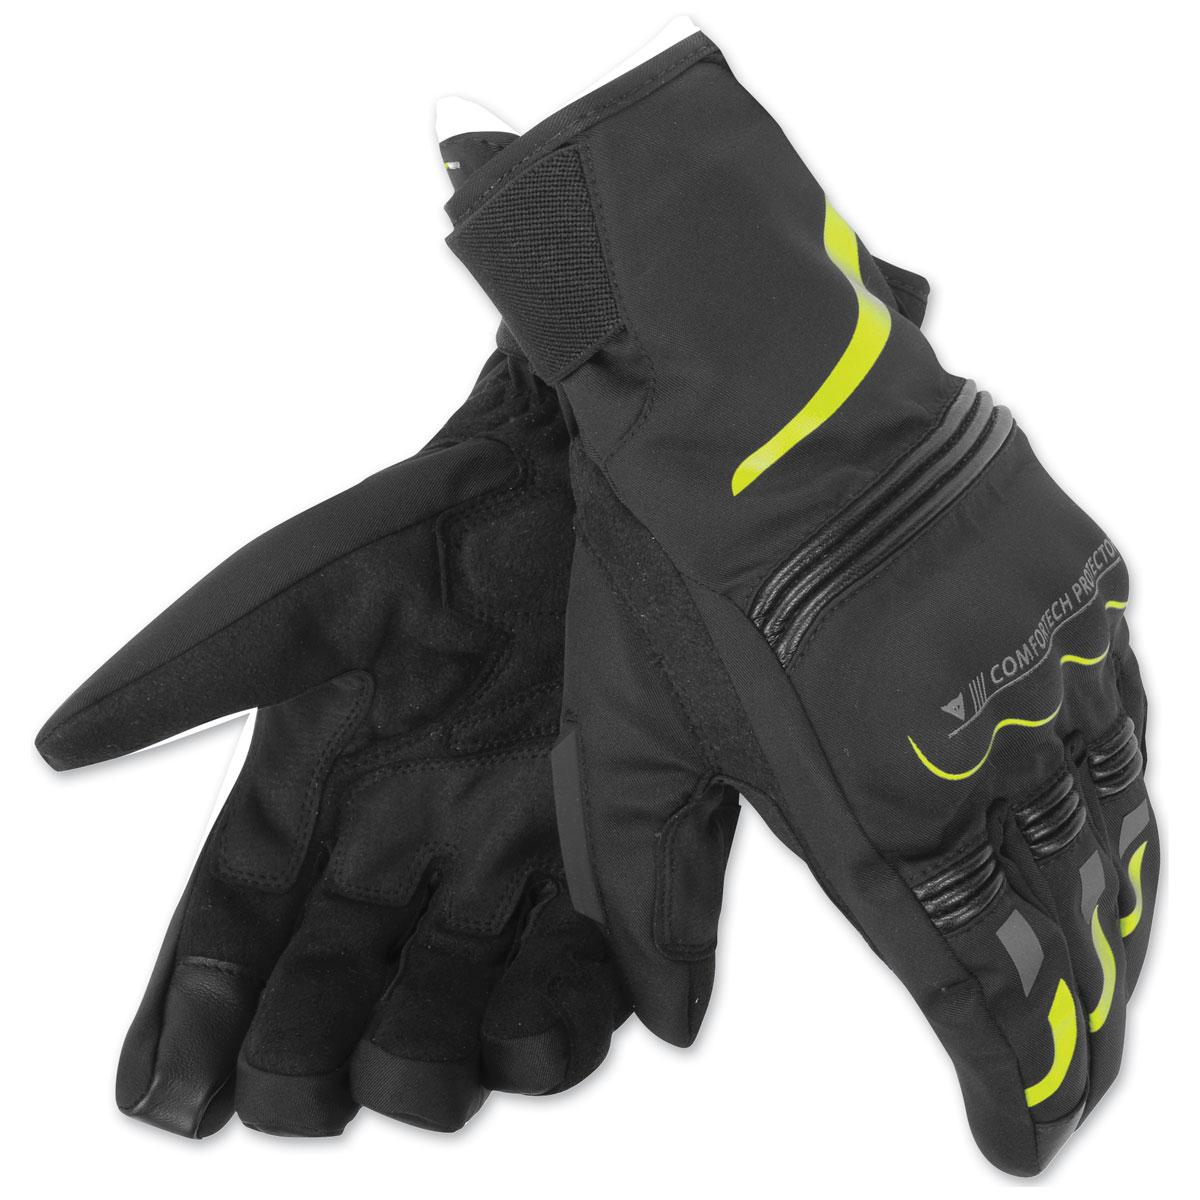 Dainese Unisex Tempest D-Dry Short Black/Fluo Yellow Gloves